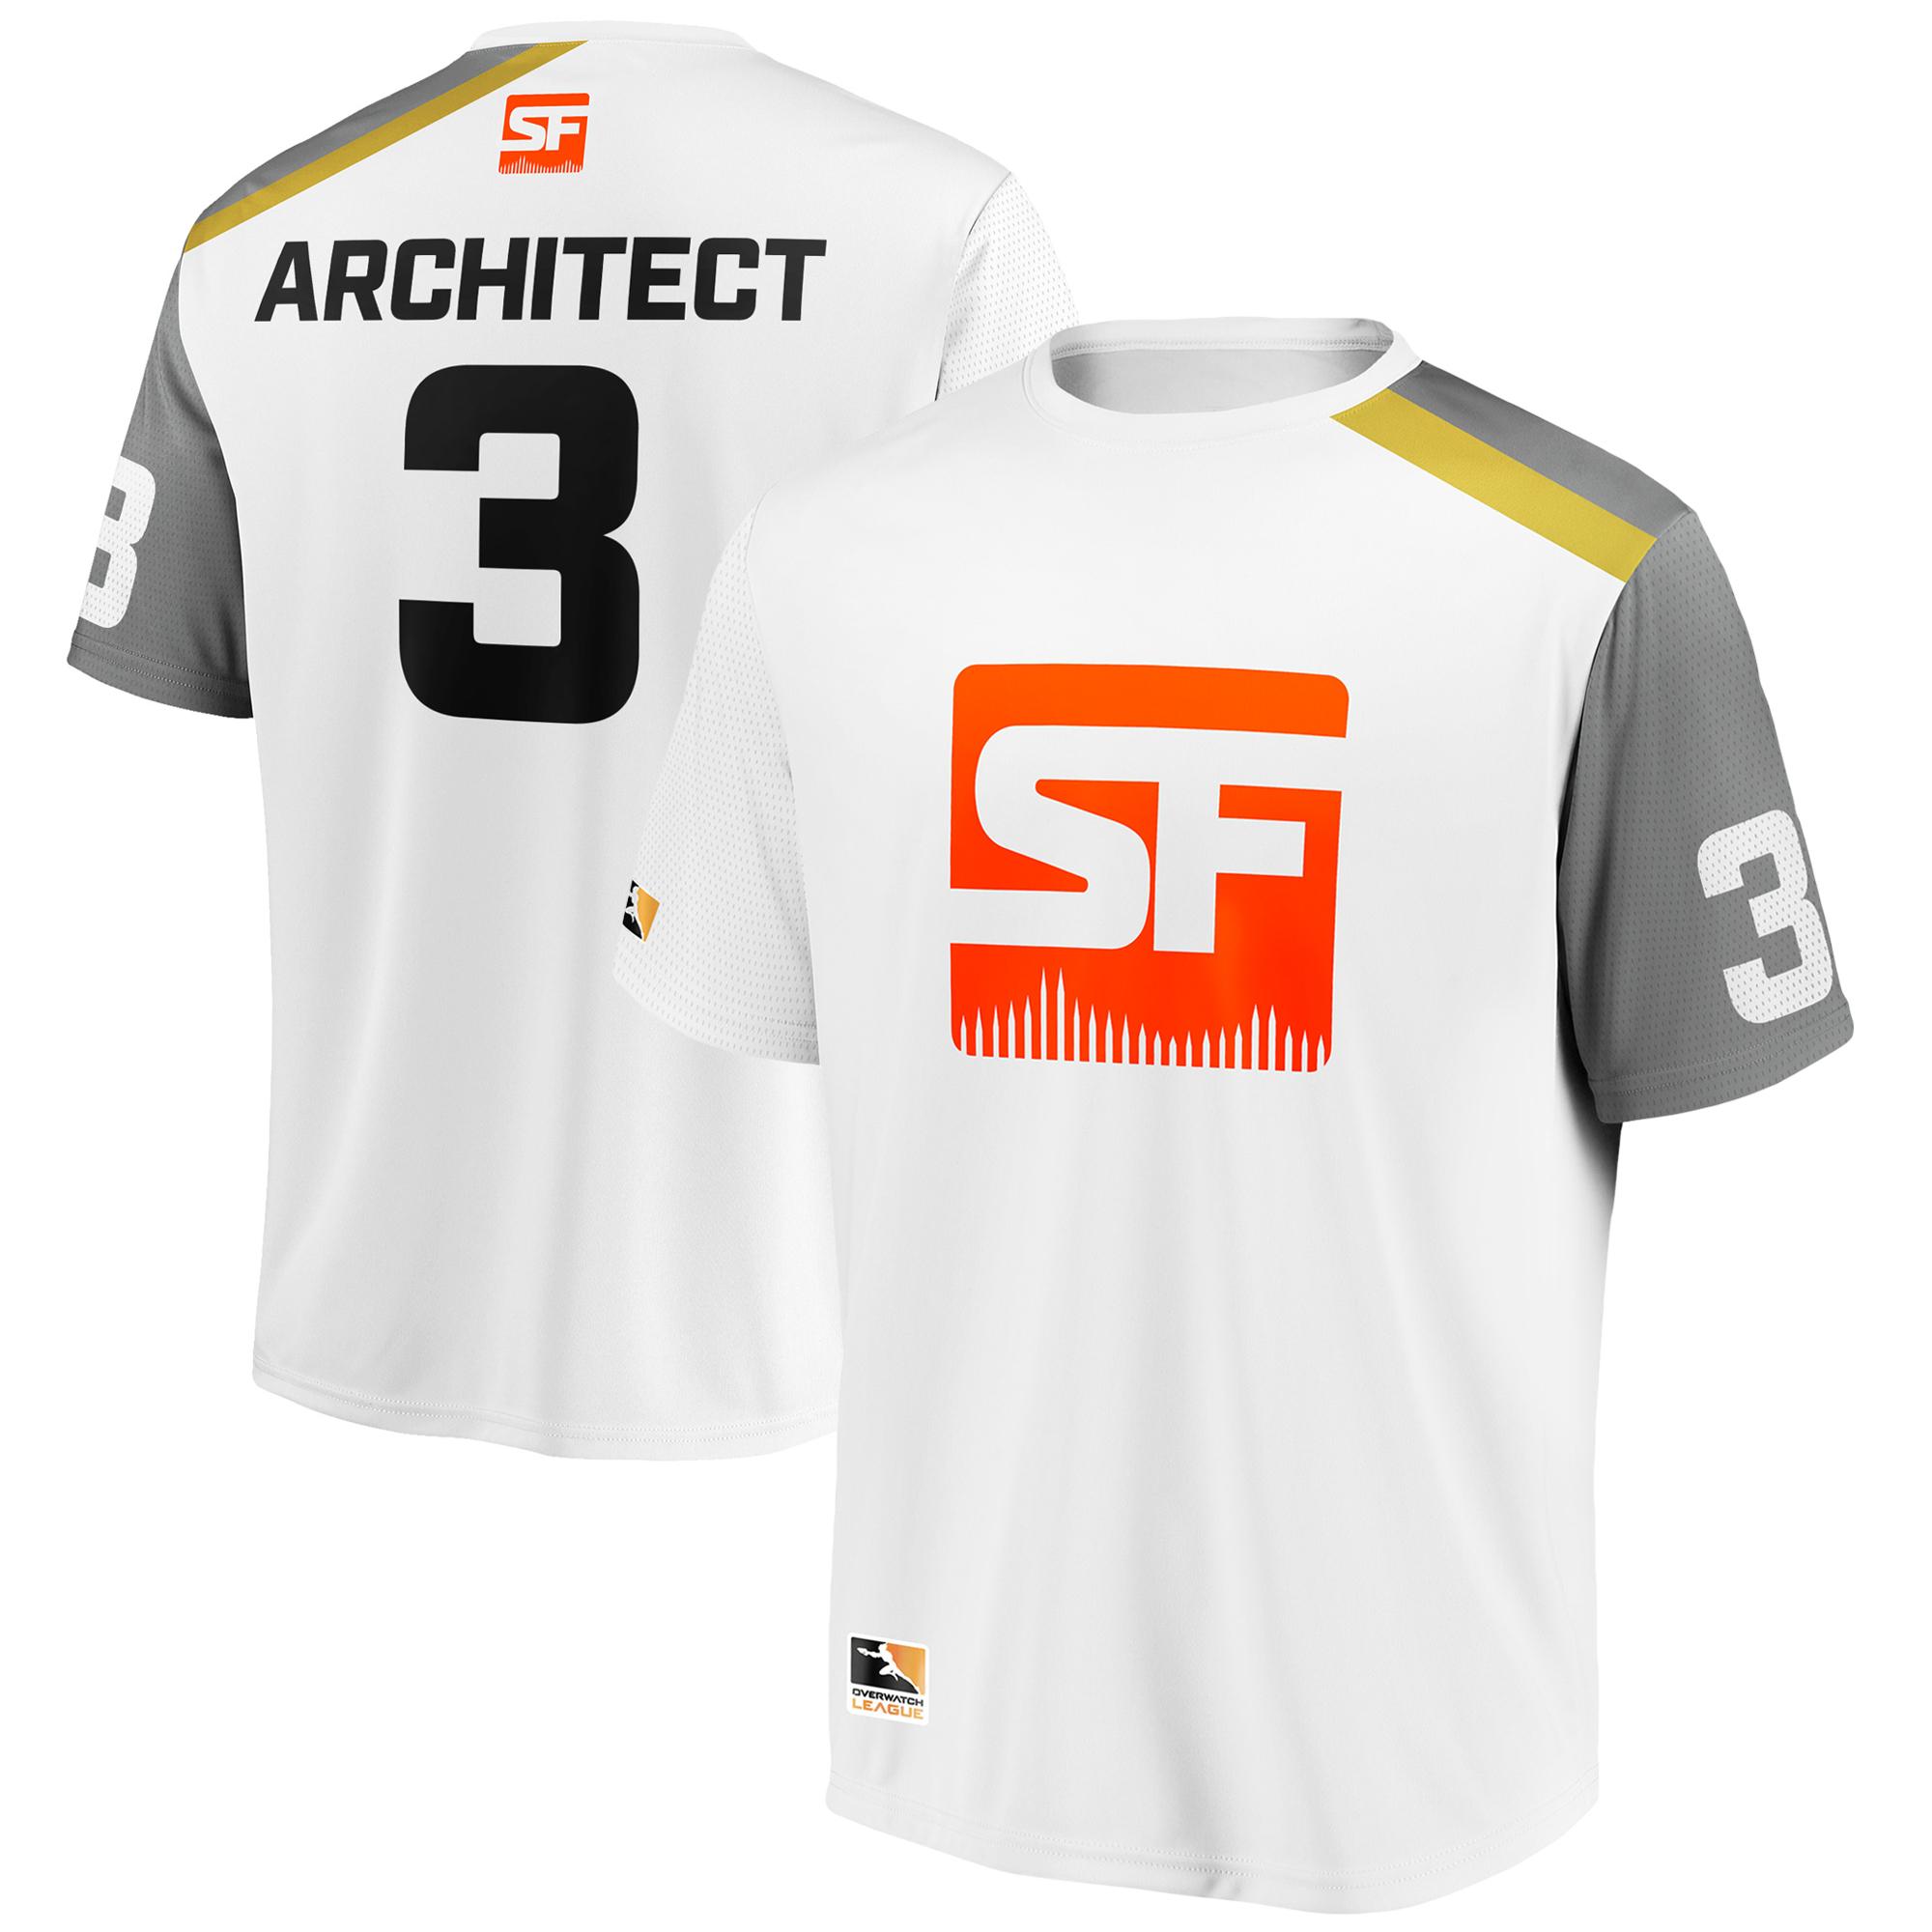 Architect San Francisco Shock Overwatch League Replica Away Jersey - White